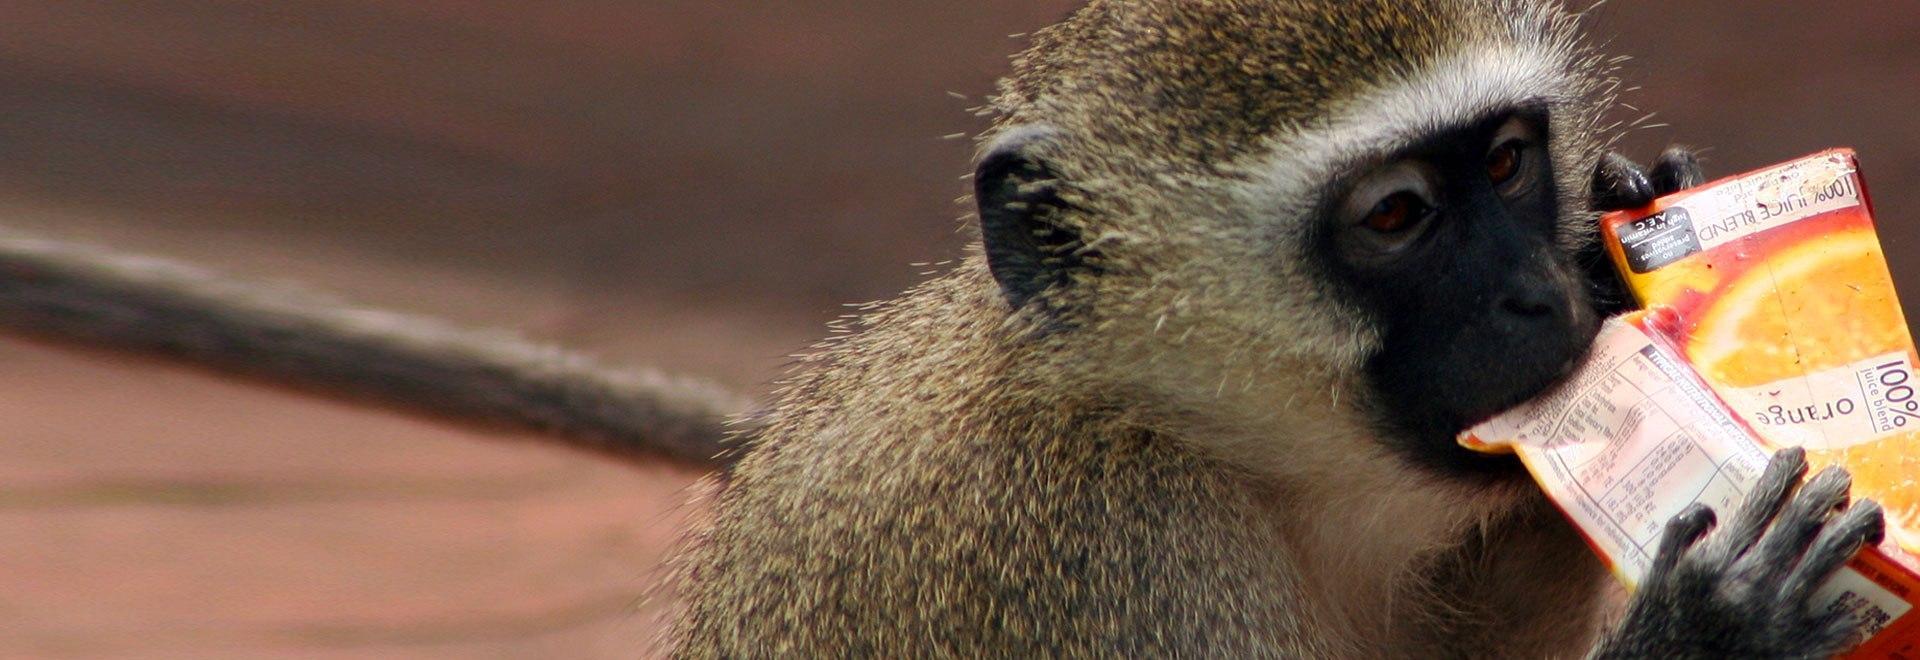 Scimmie: animali da salvare